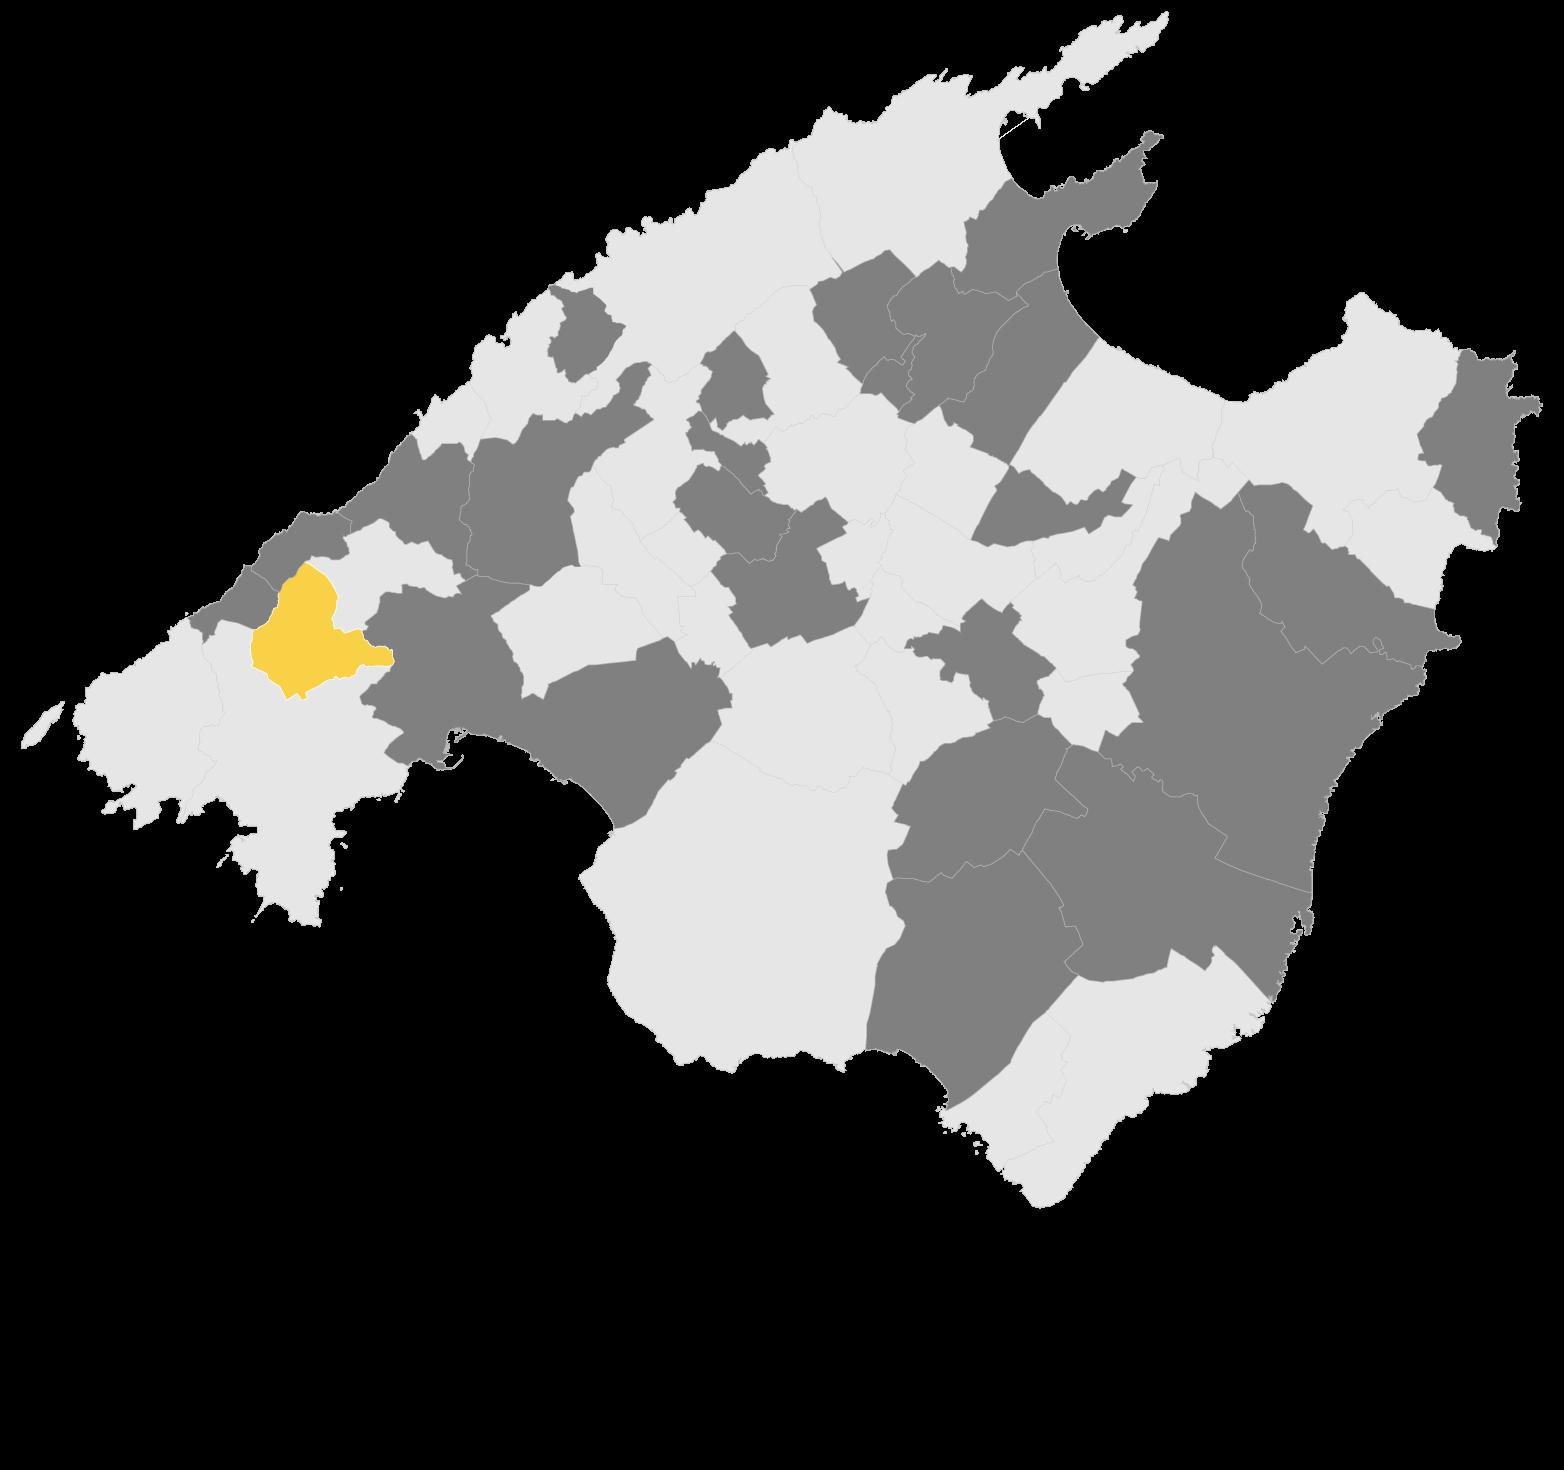 Mapa Puigpunyent